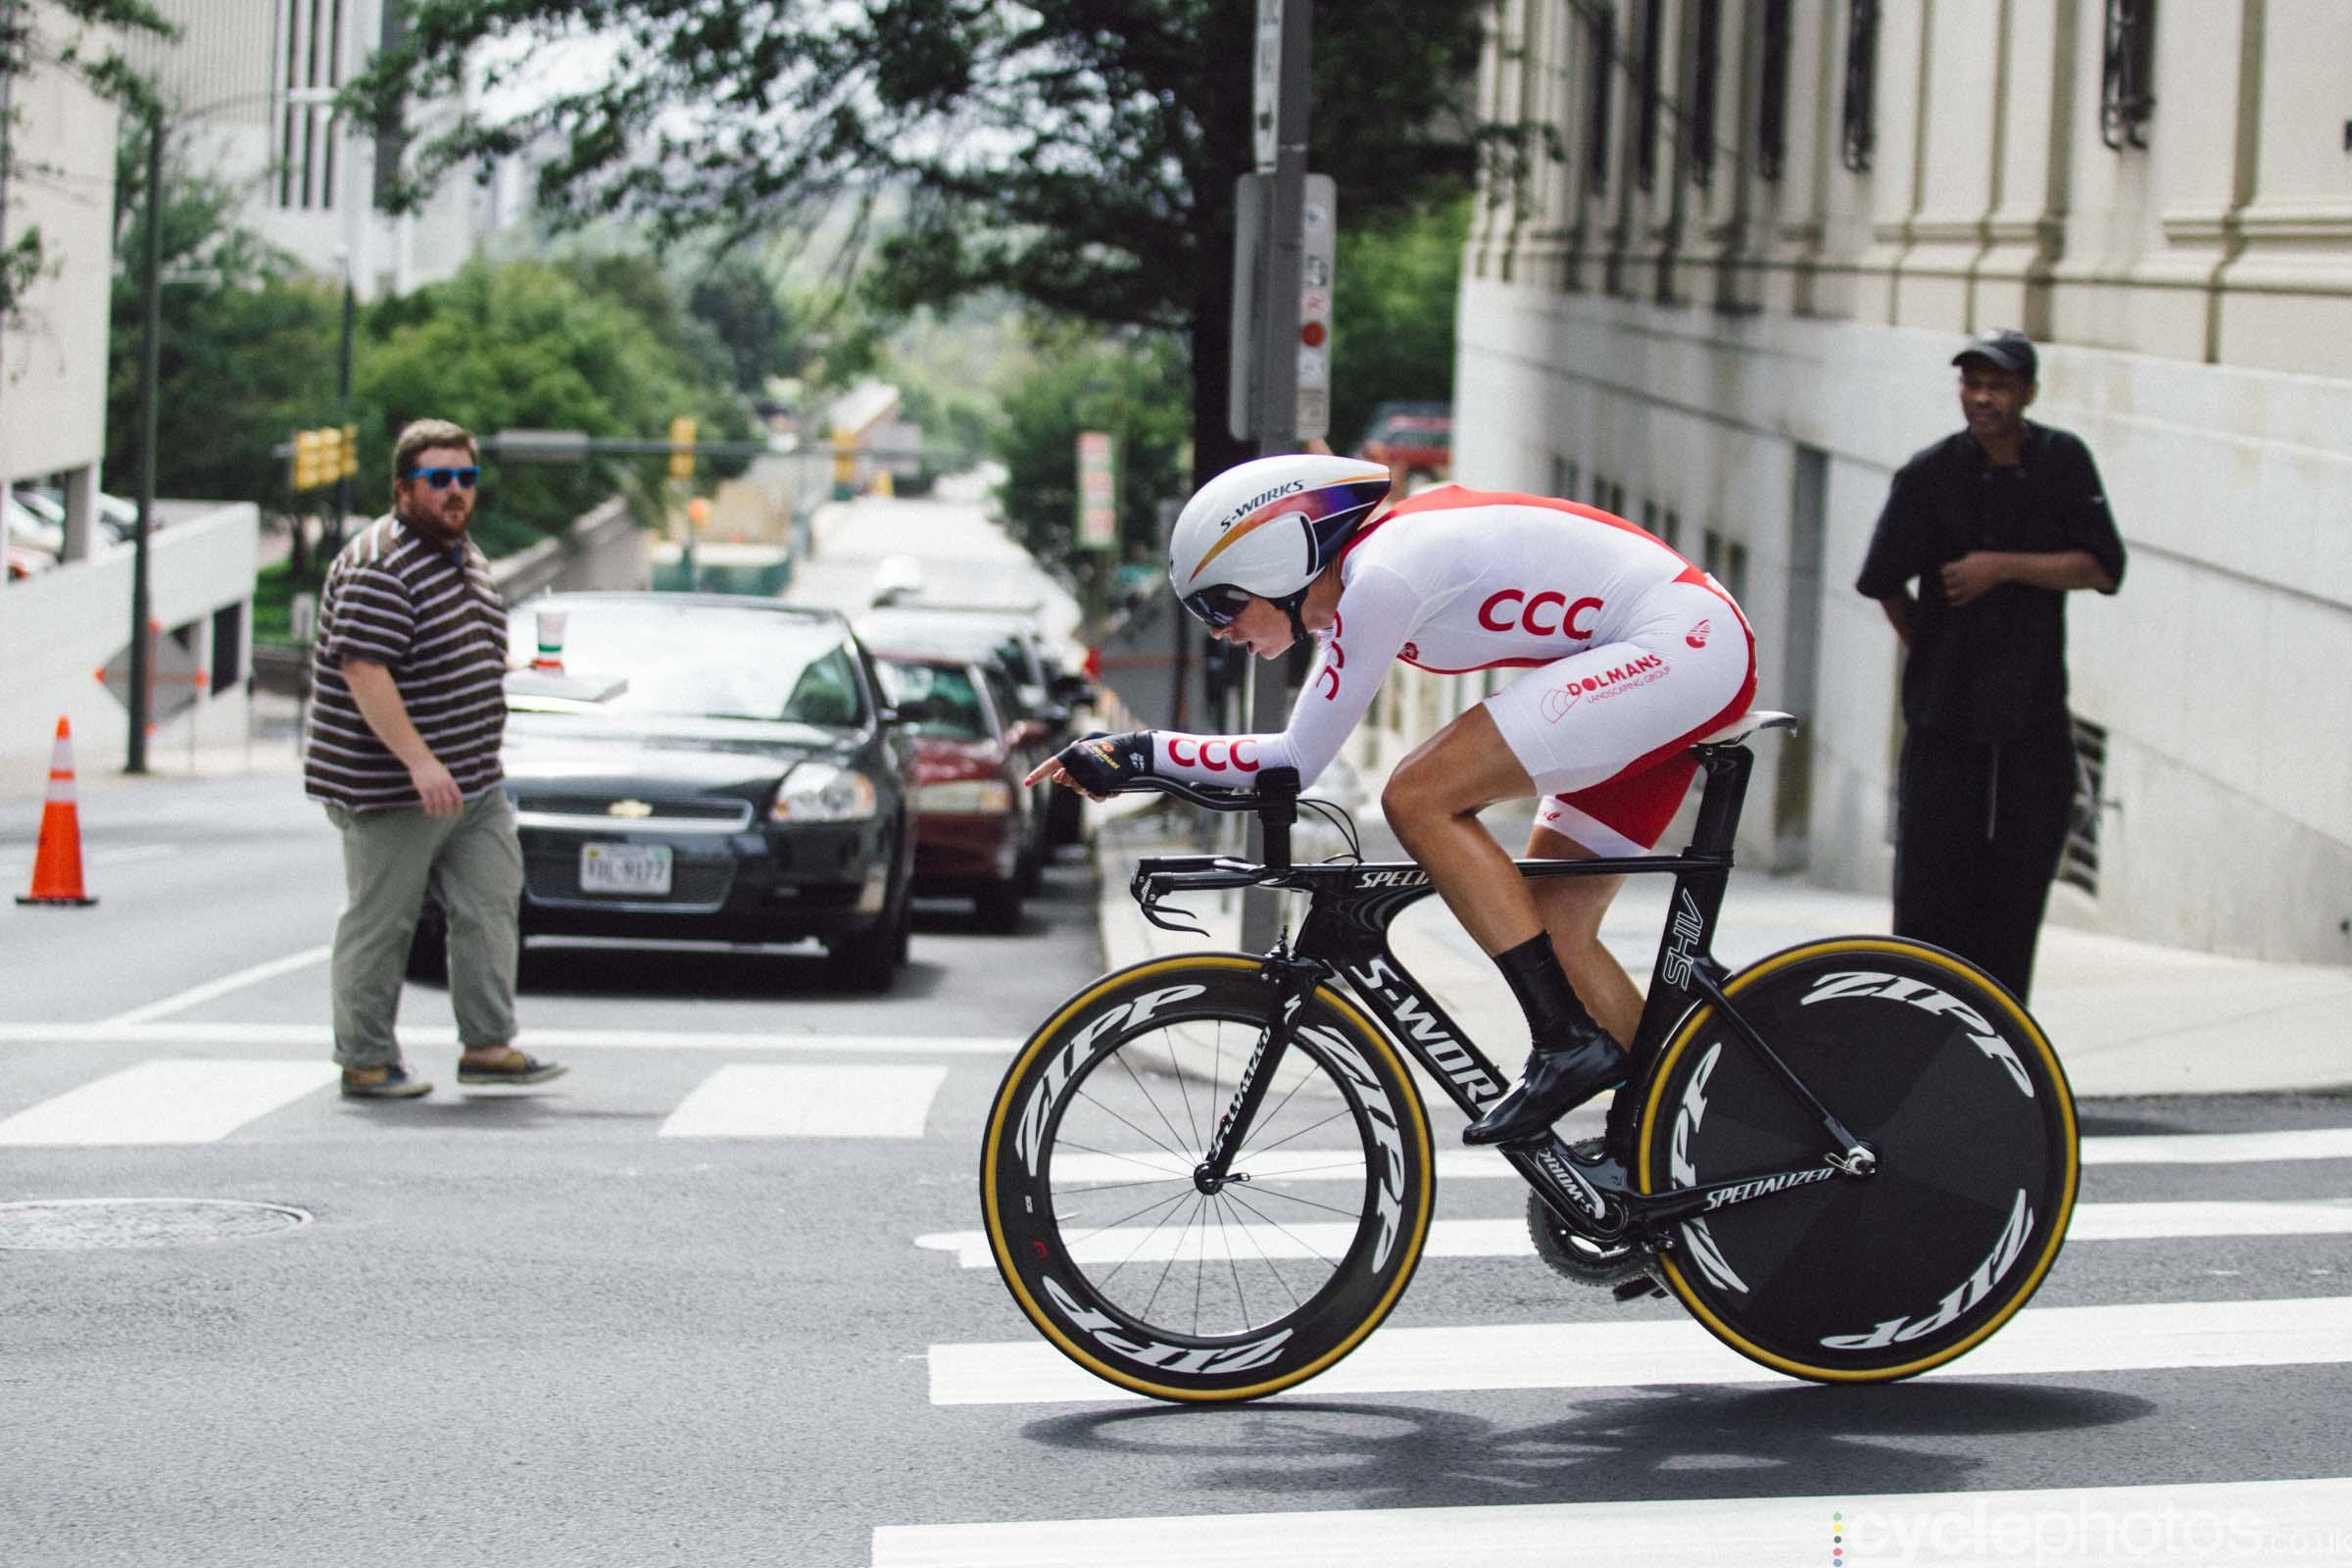 cyclephotos-world-champs-richmond-135301